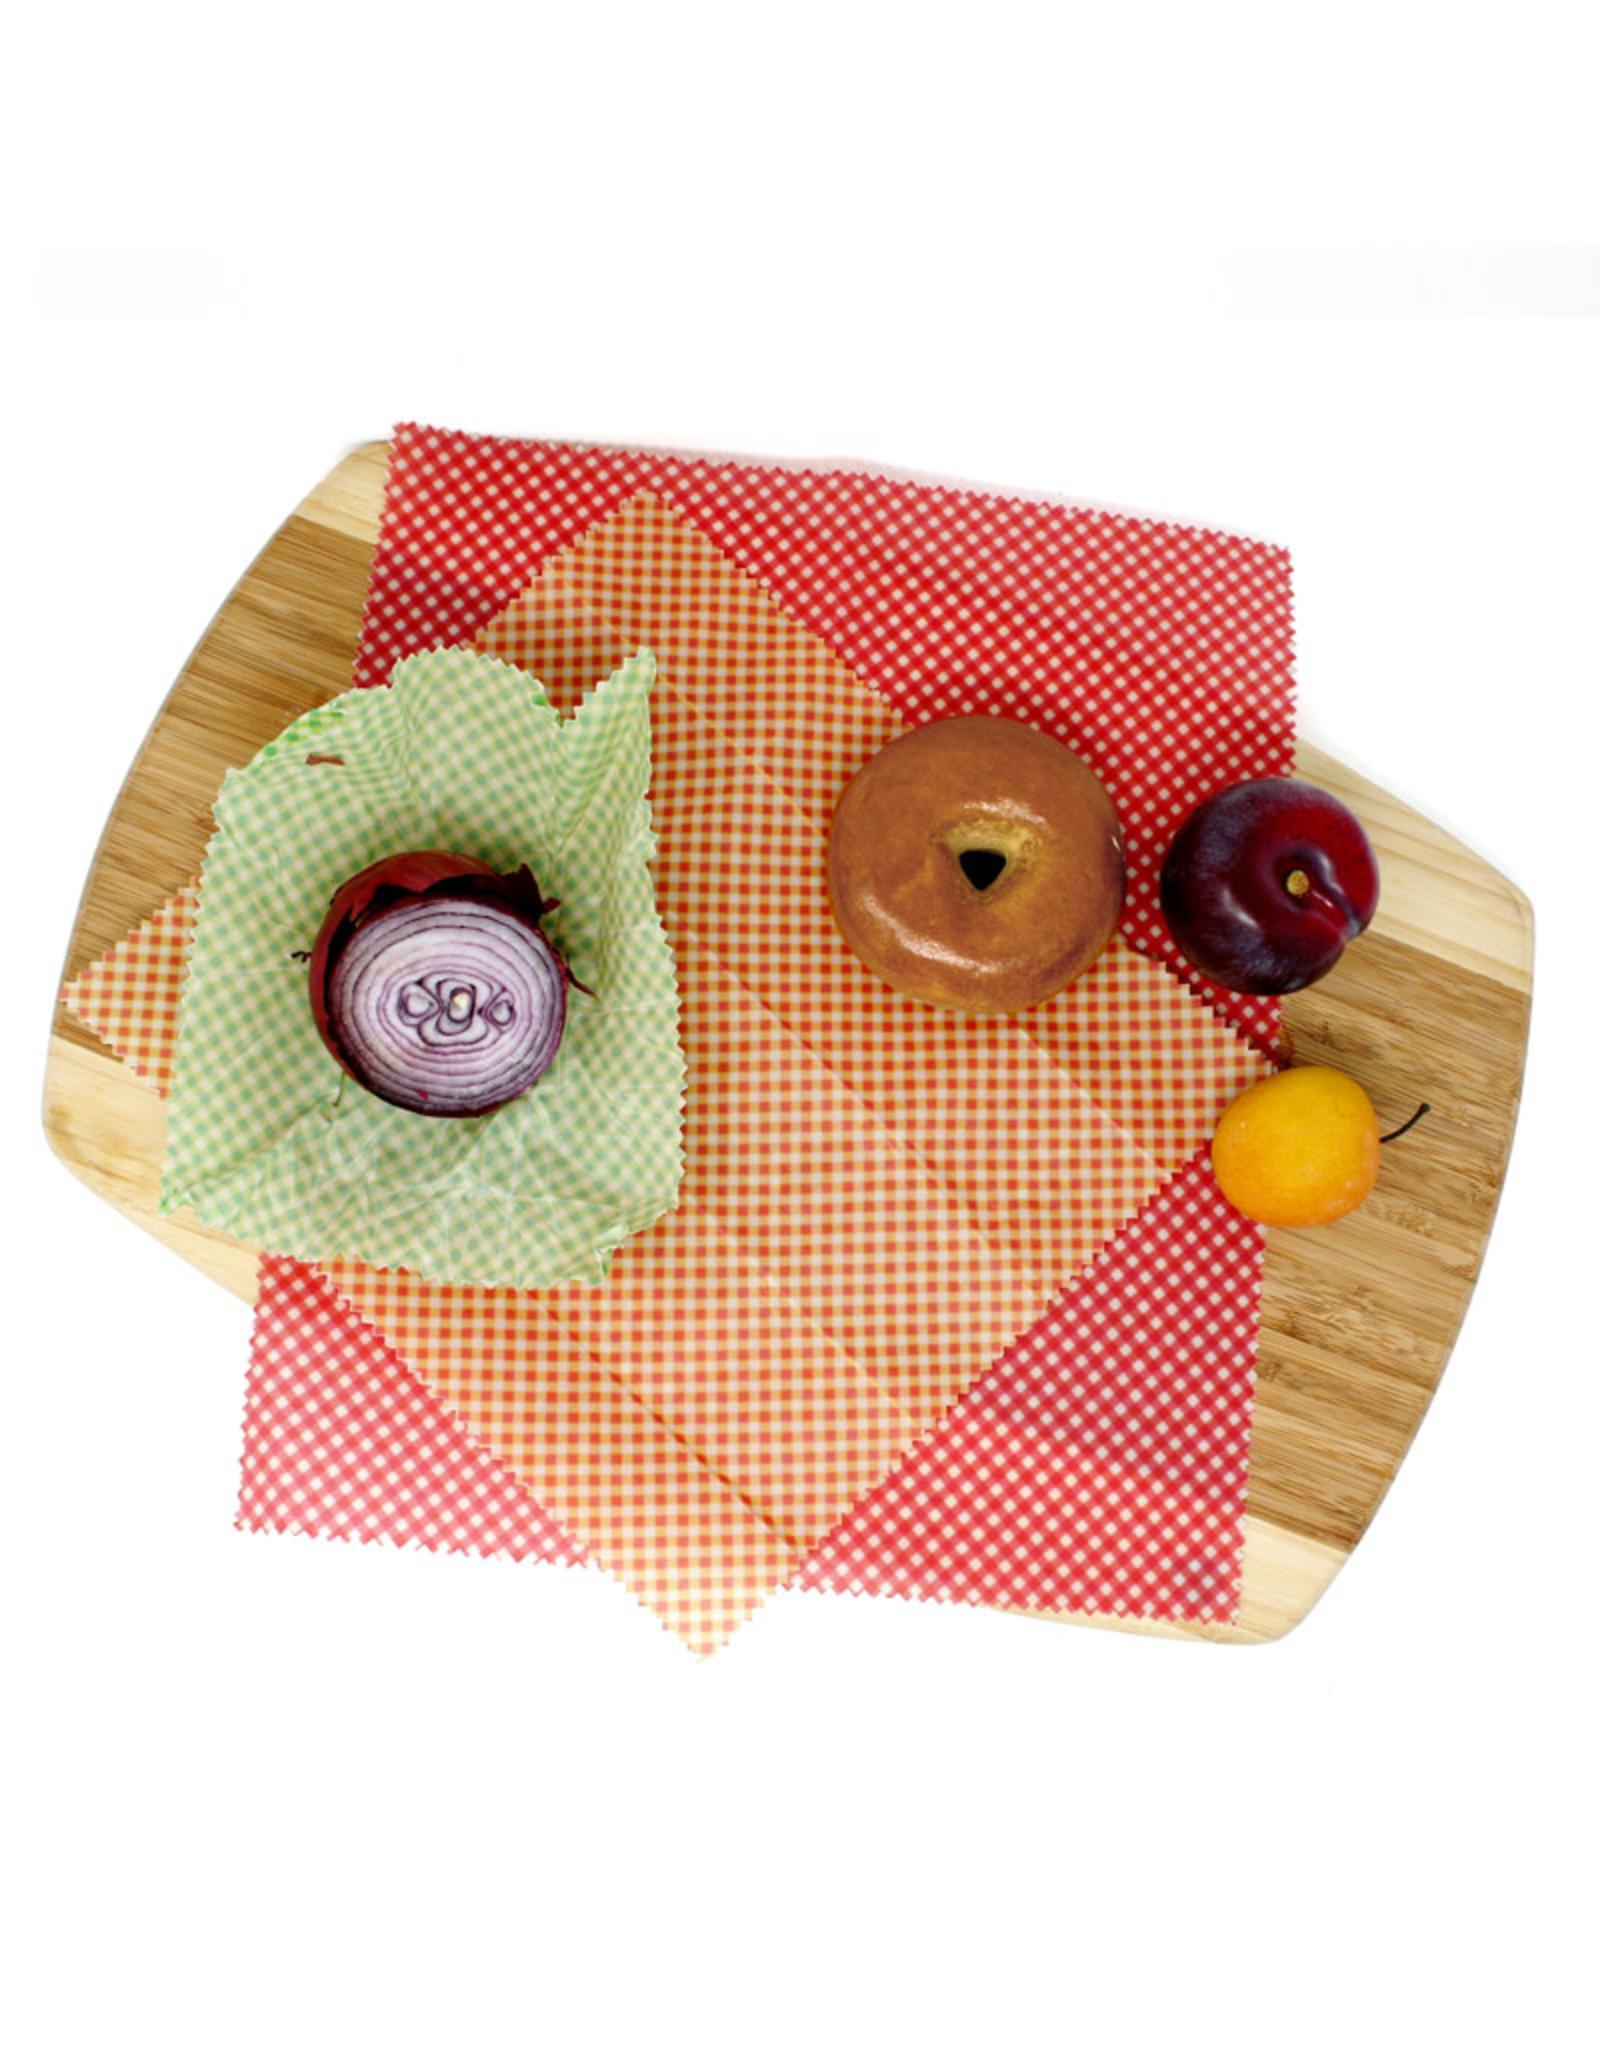 Danesco Danesco Kitchenware - Beeswax Food Wraps